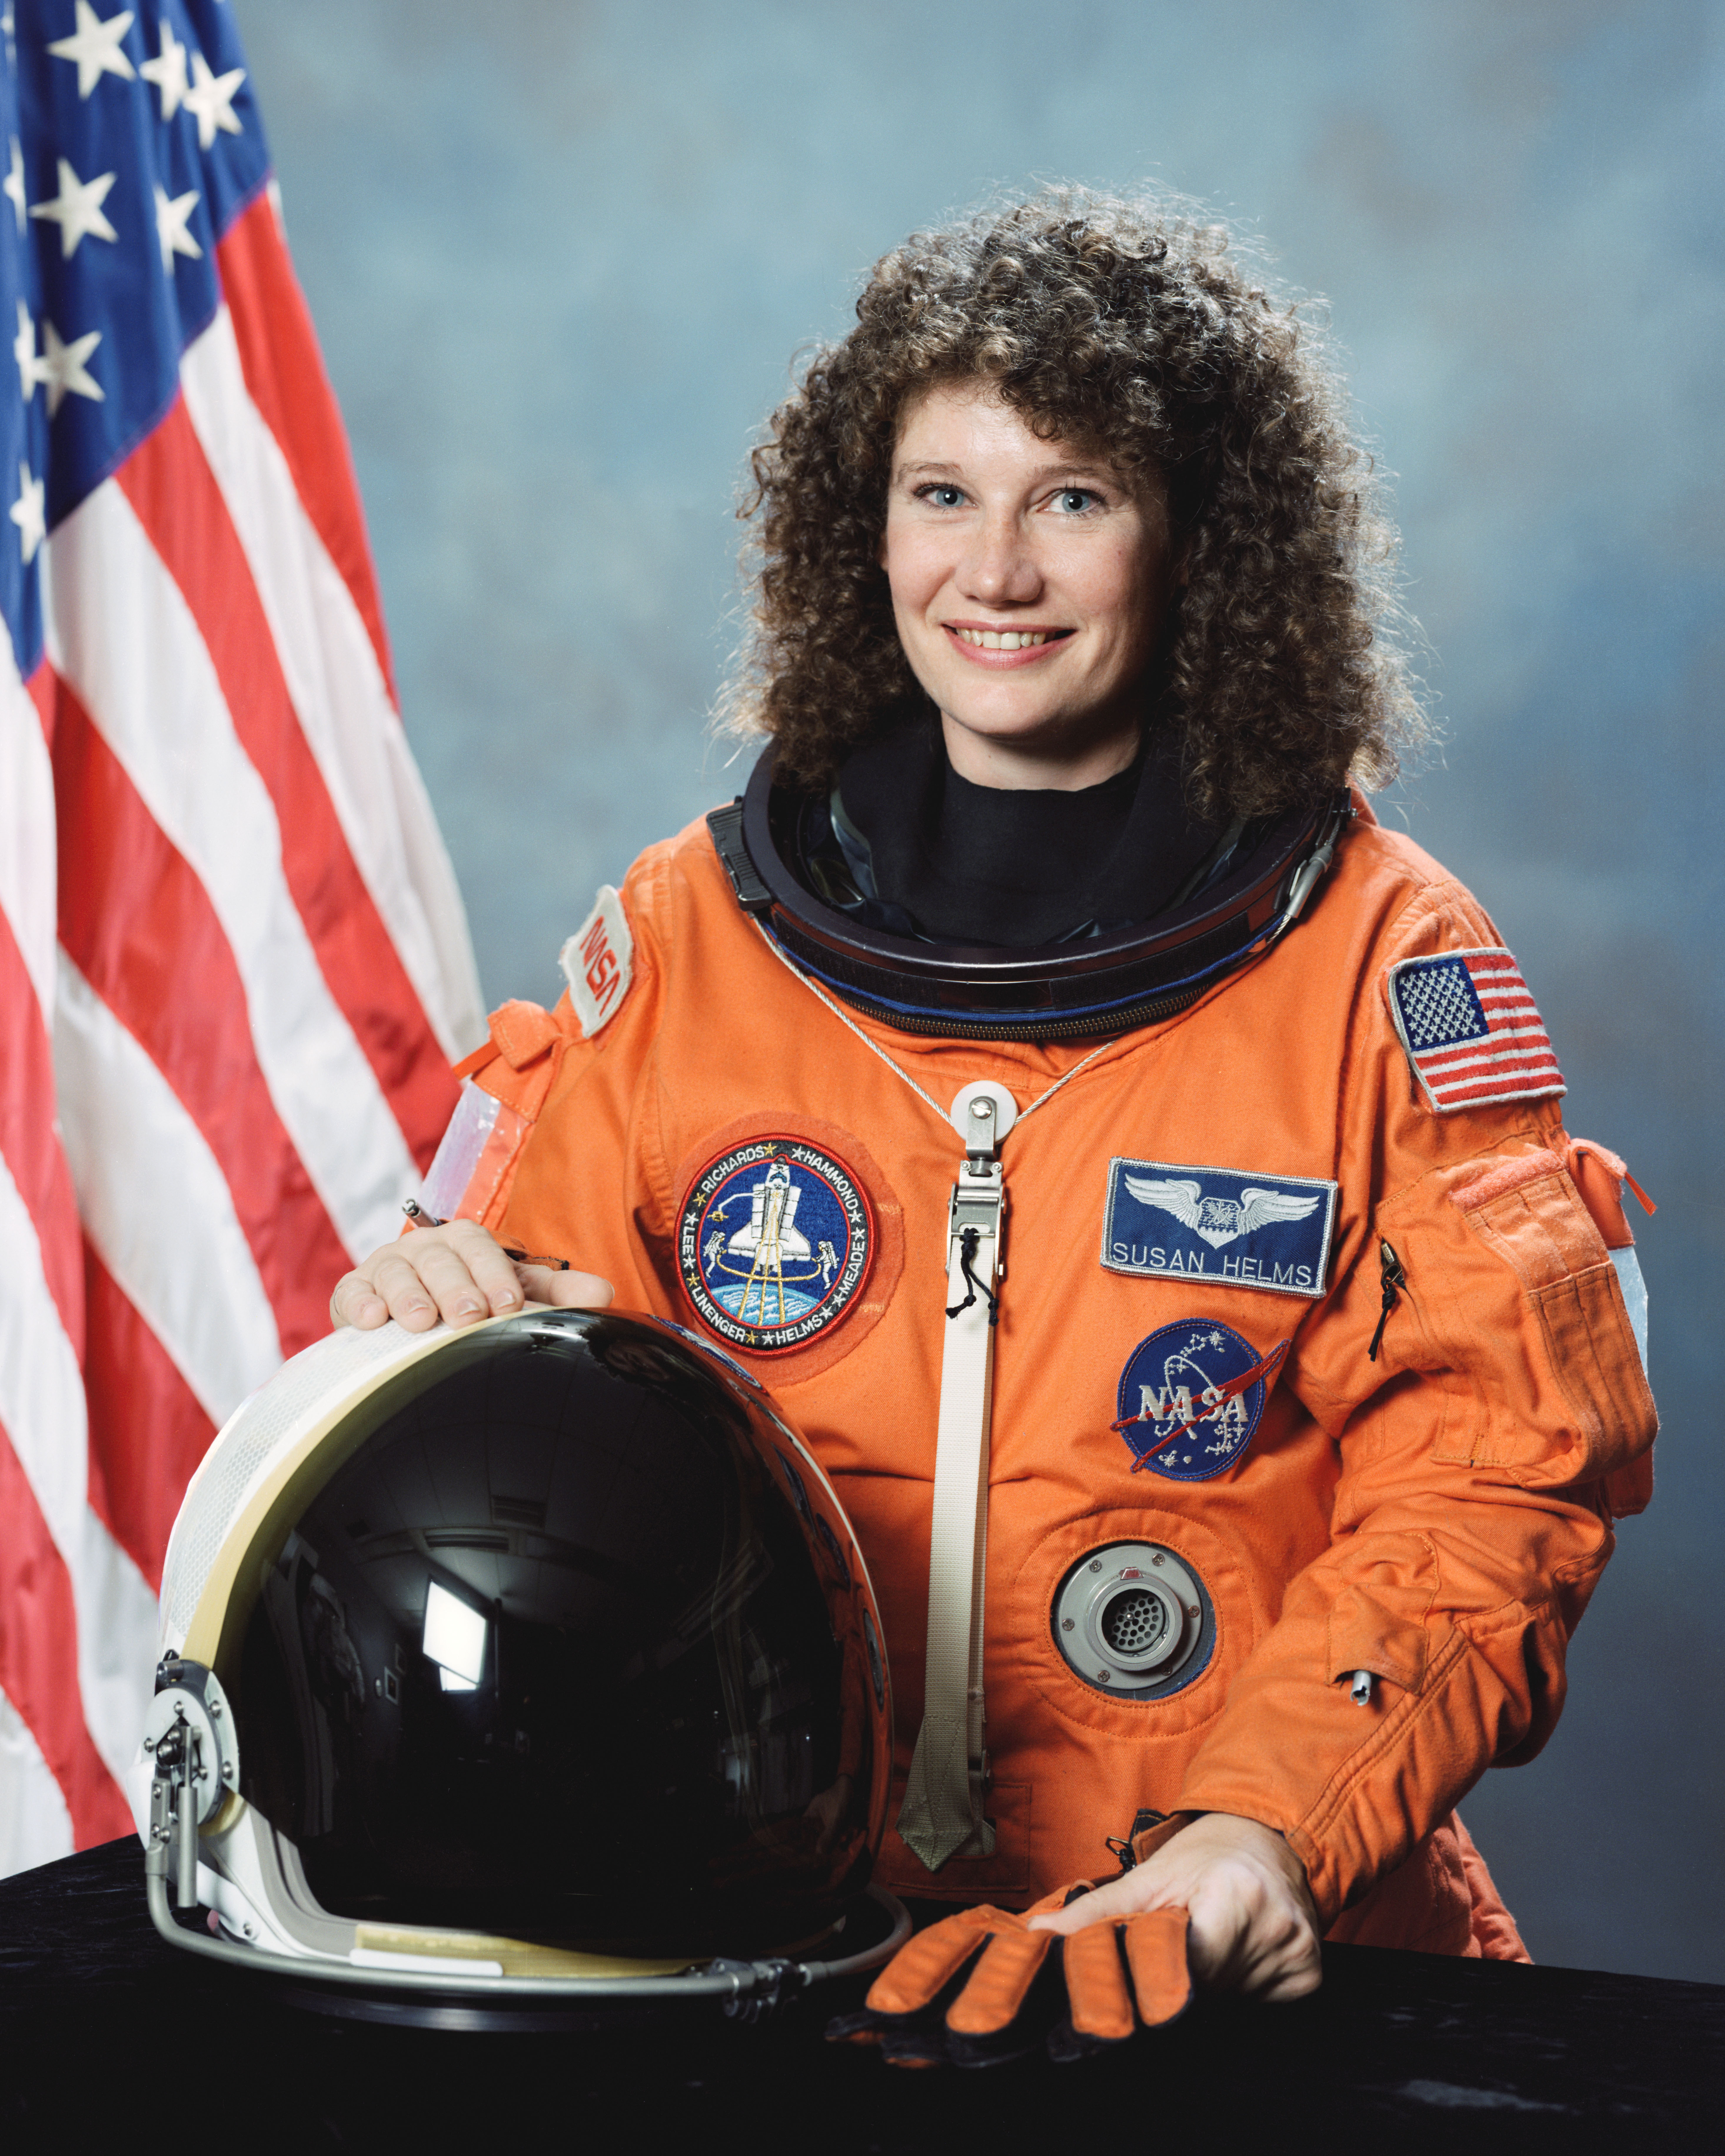 Astronaut Susan J. Helms.jpg